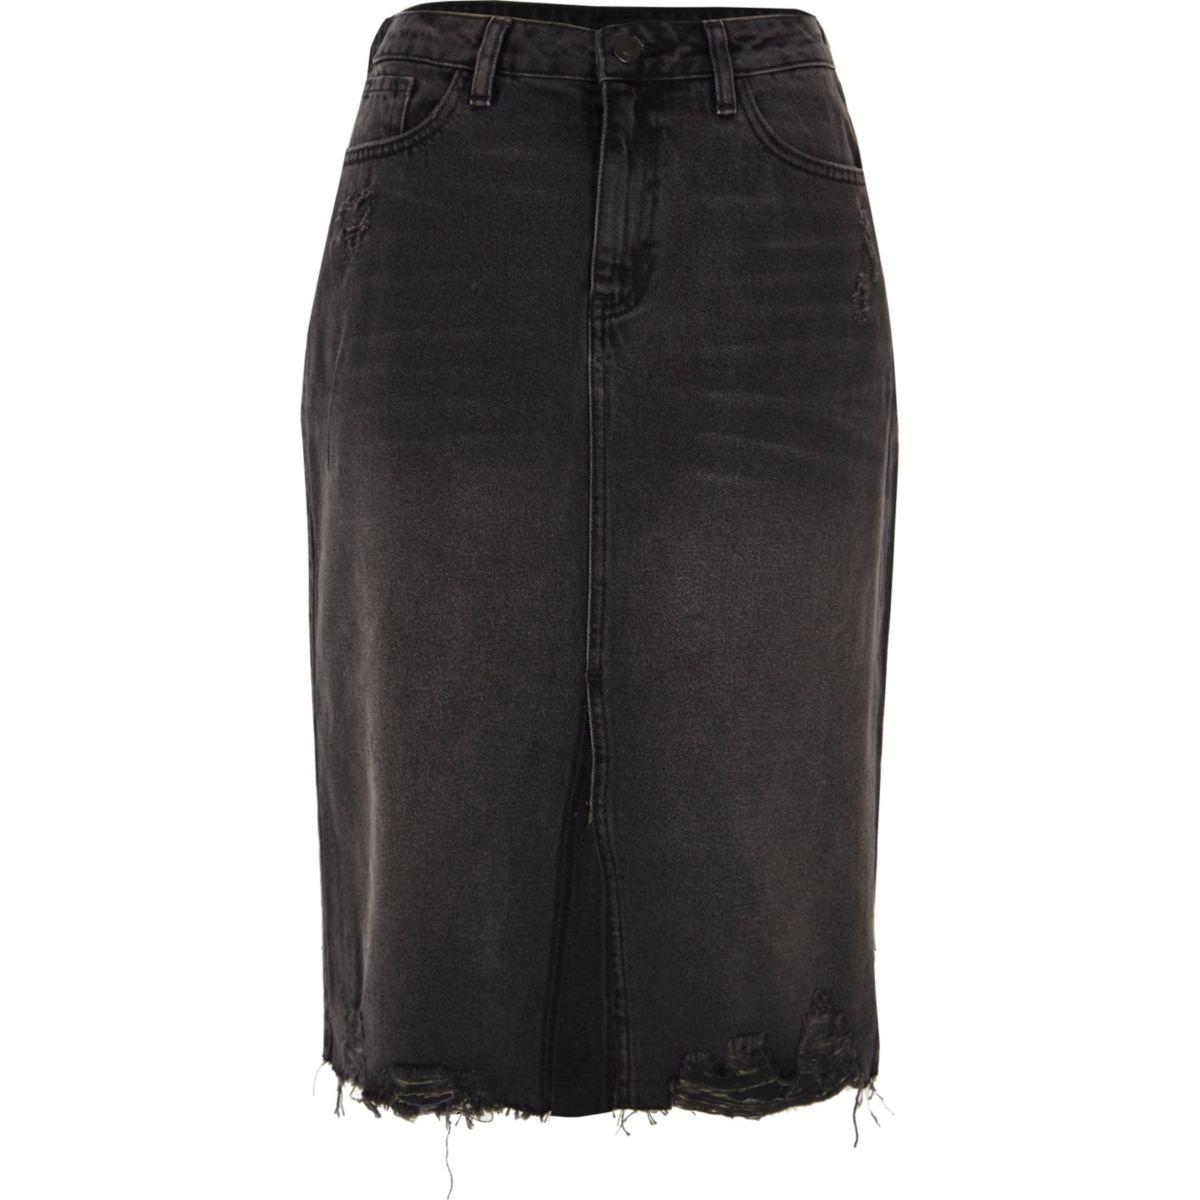 Black distressed split hem denim pencil skirt